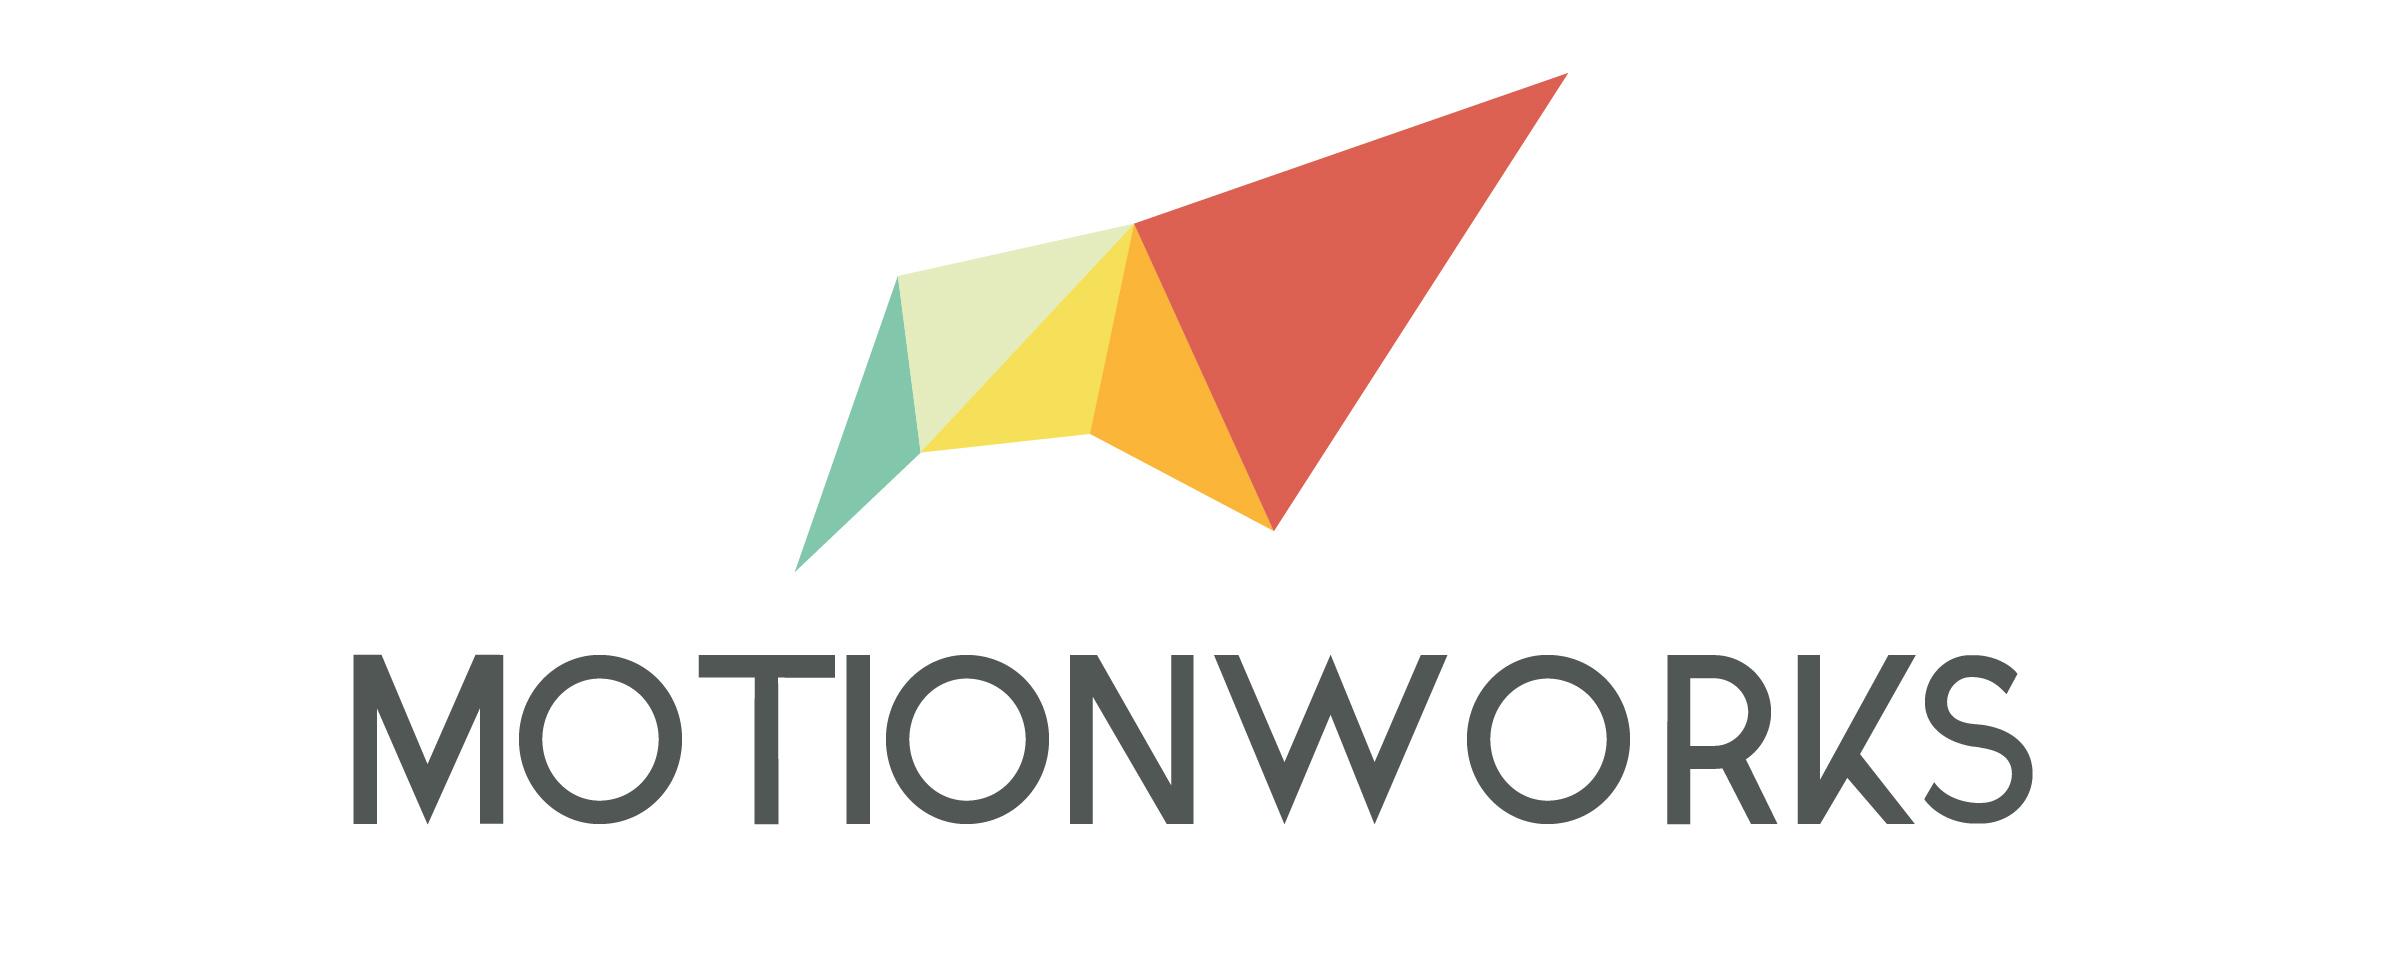 MOTIONWORKS